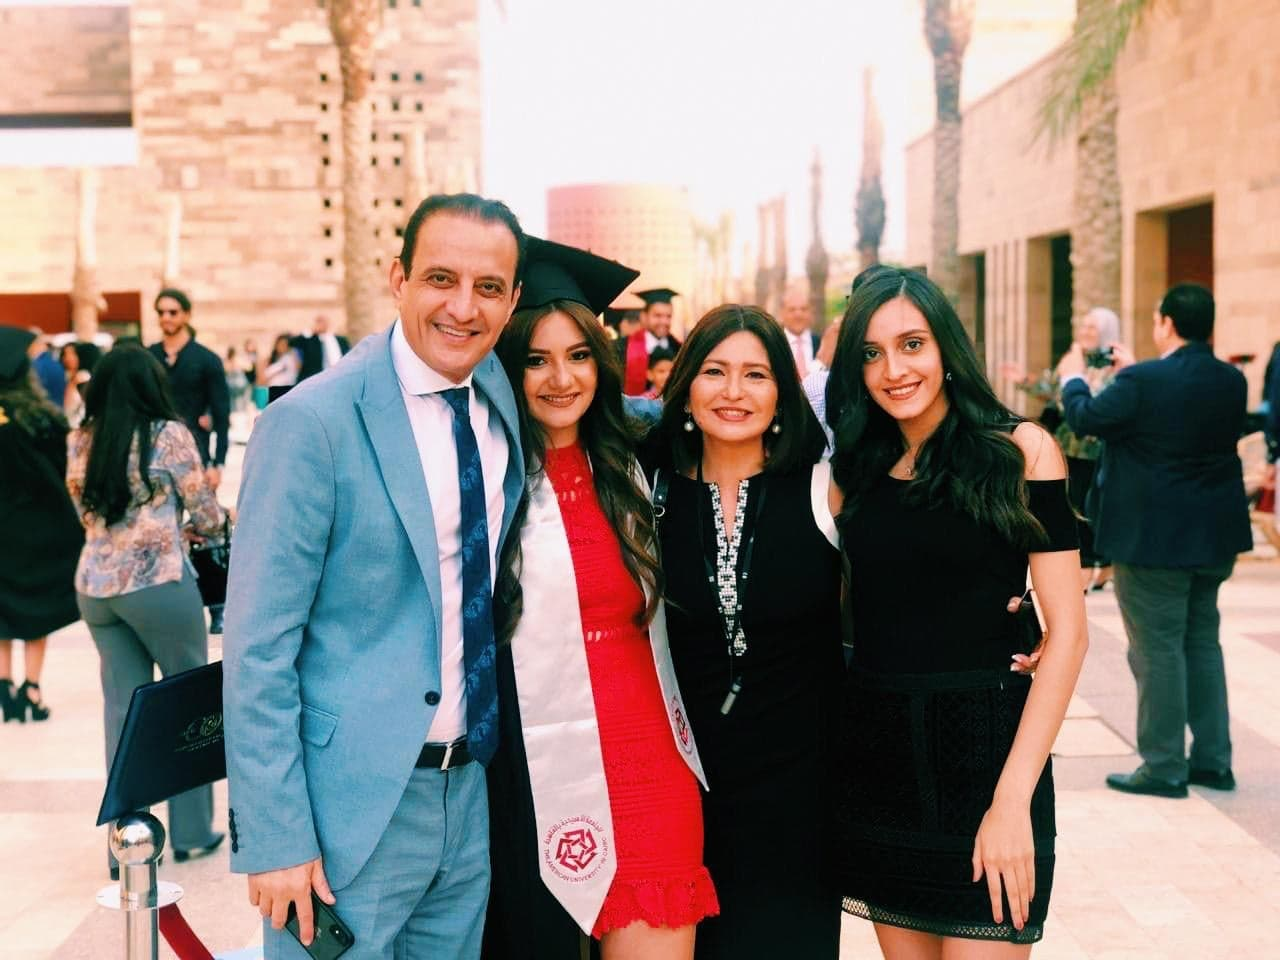 طارق علام يشهد حفل تخرج ابنته عهد (2)